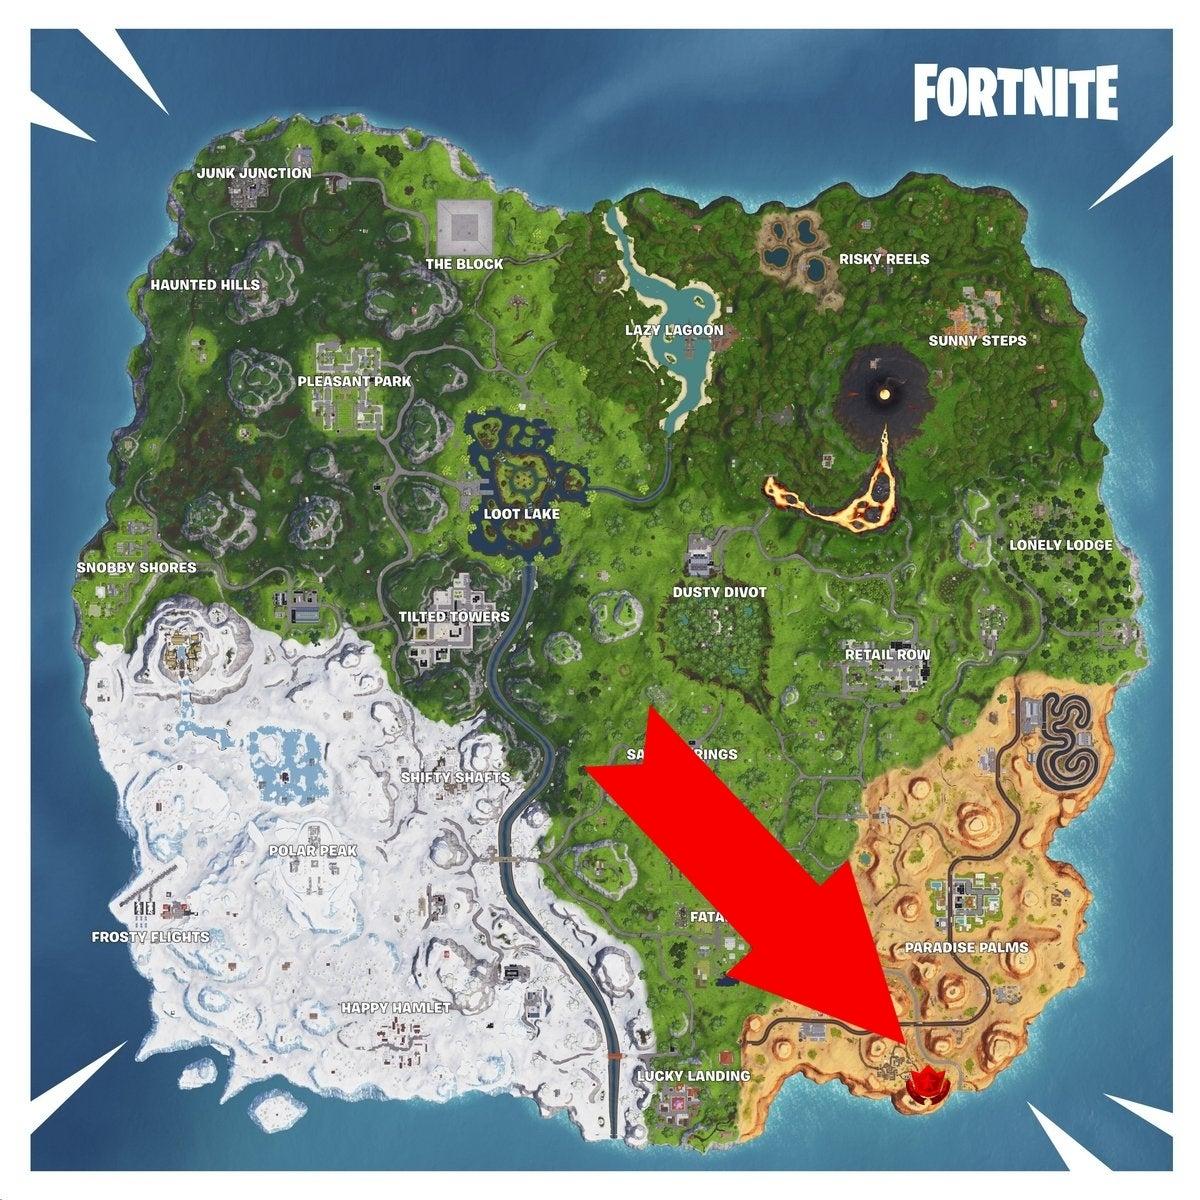 fortnite map 1 - fortnite visit a giant face map